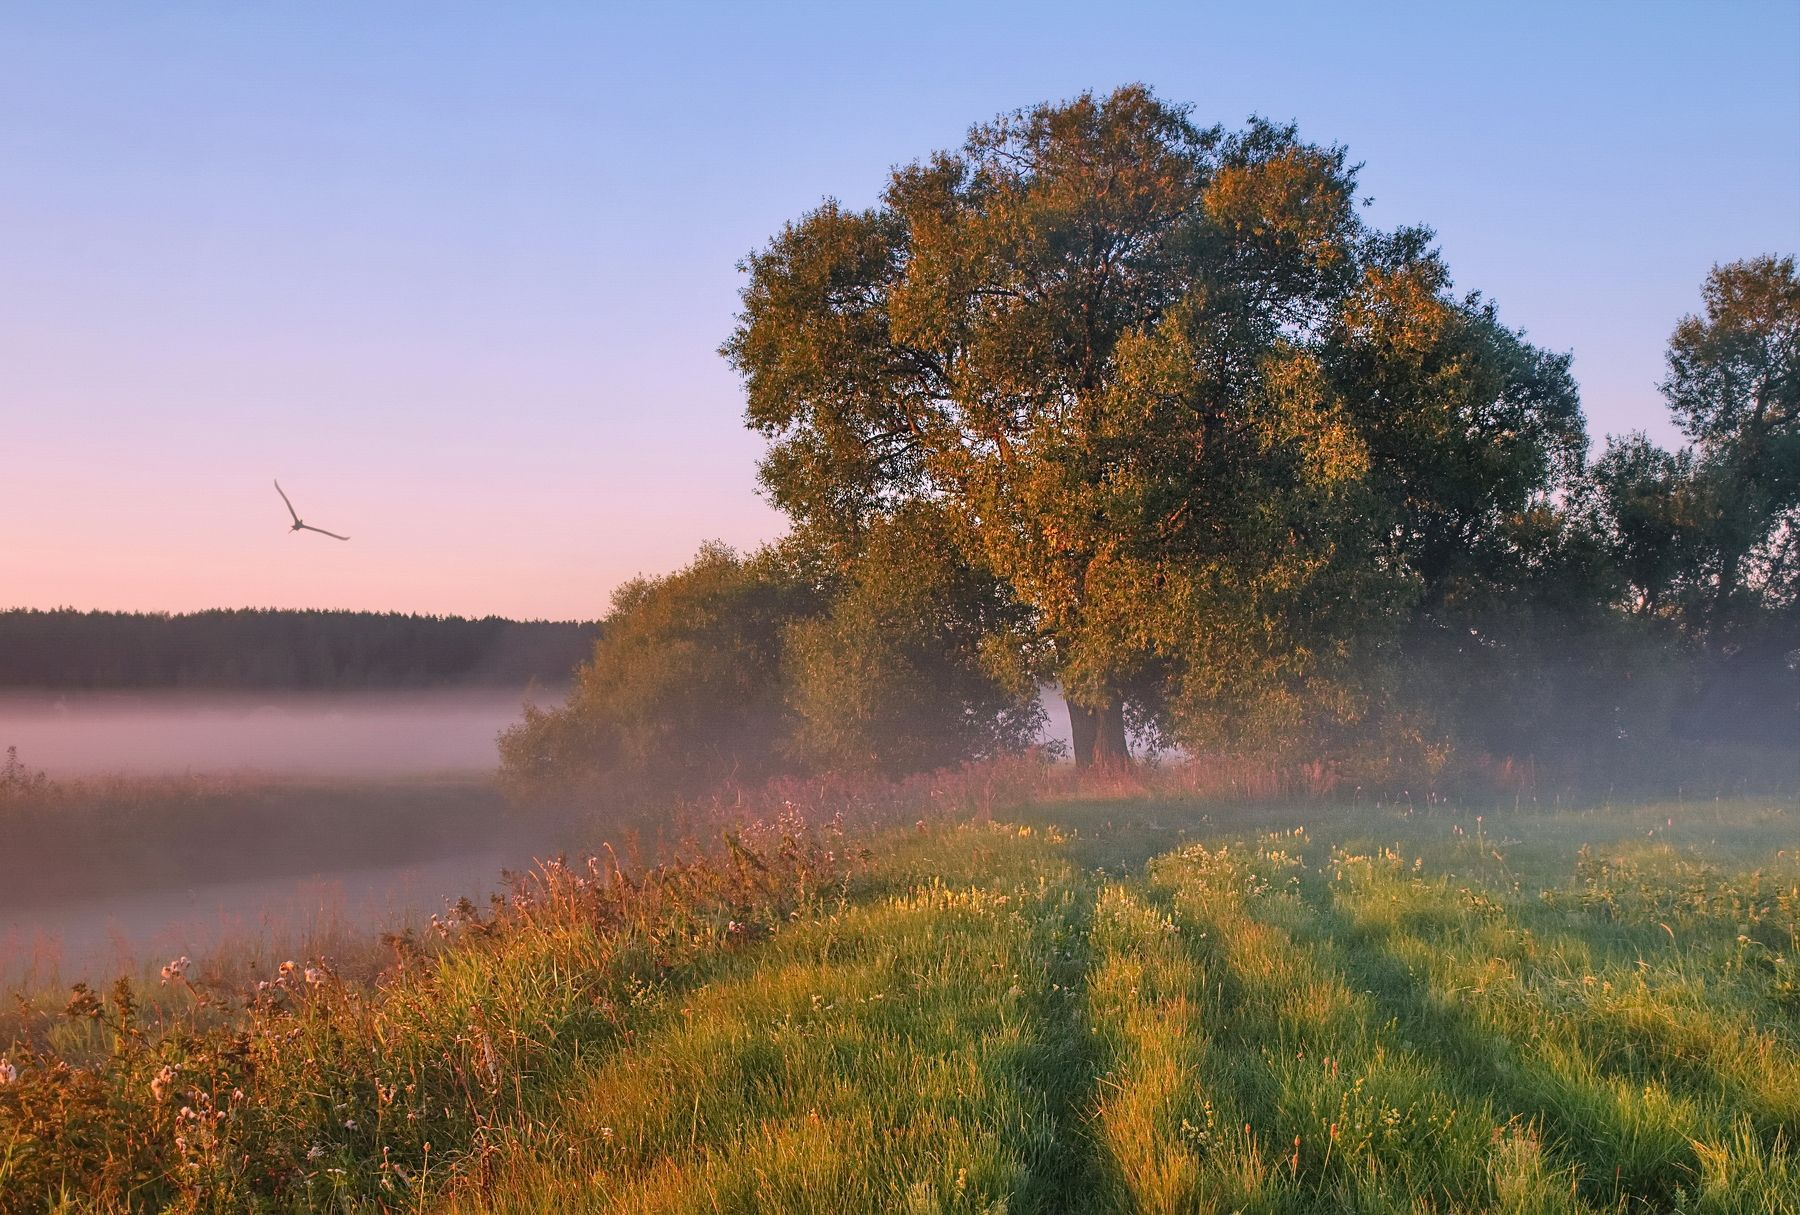 Летом на рассвете #утро #туман #солнце#утро #туман #солнце ...